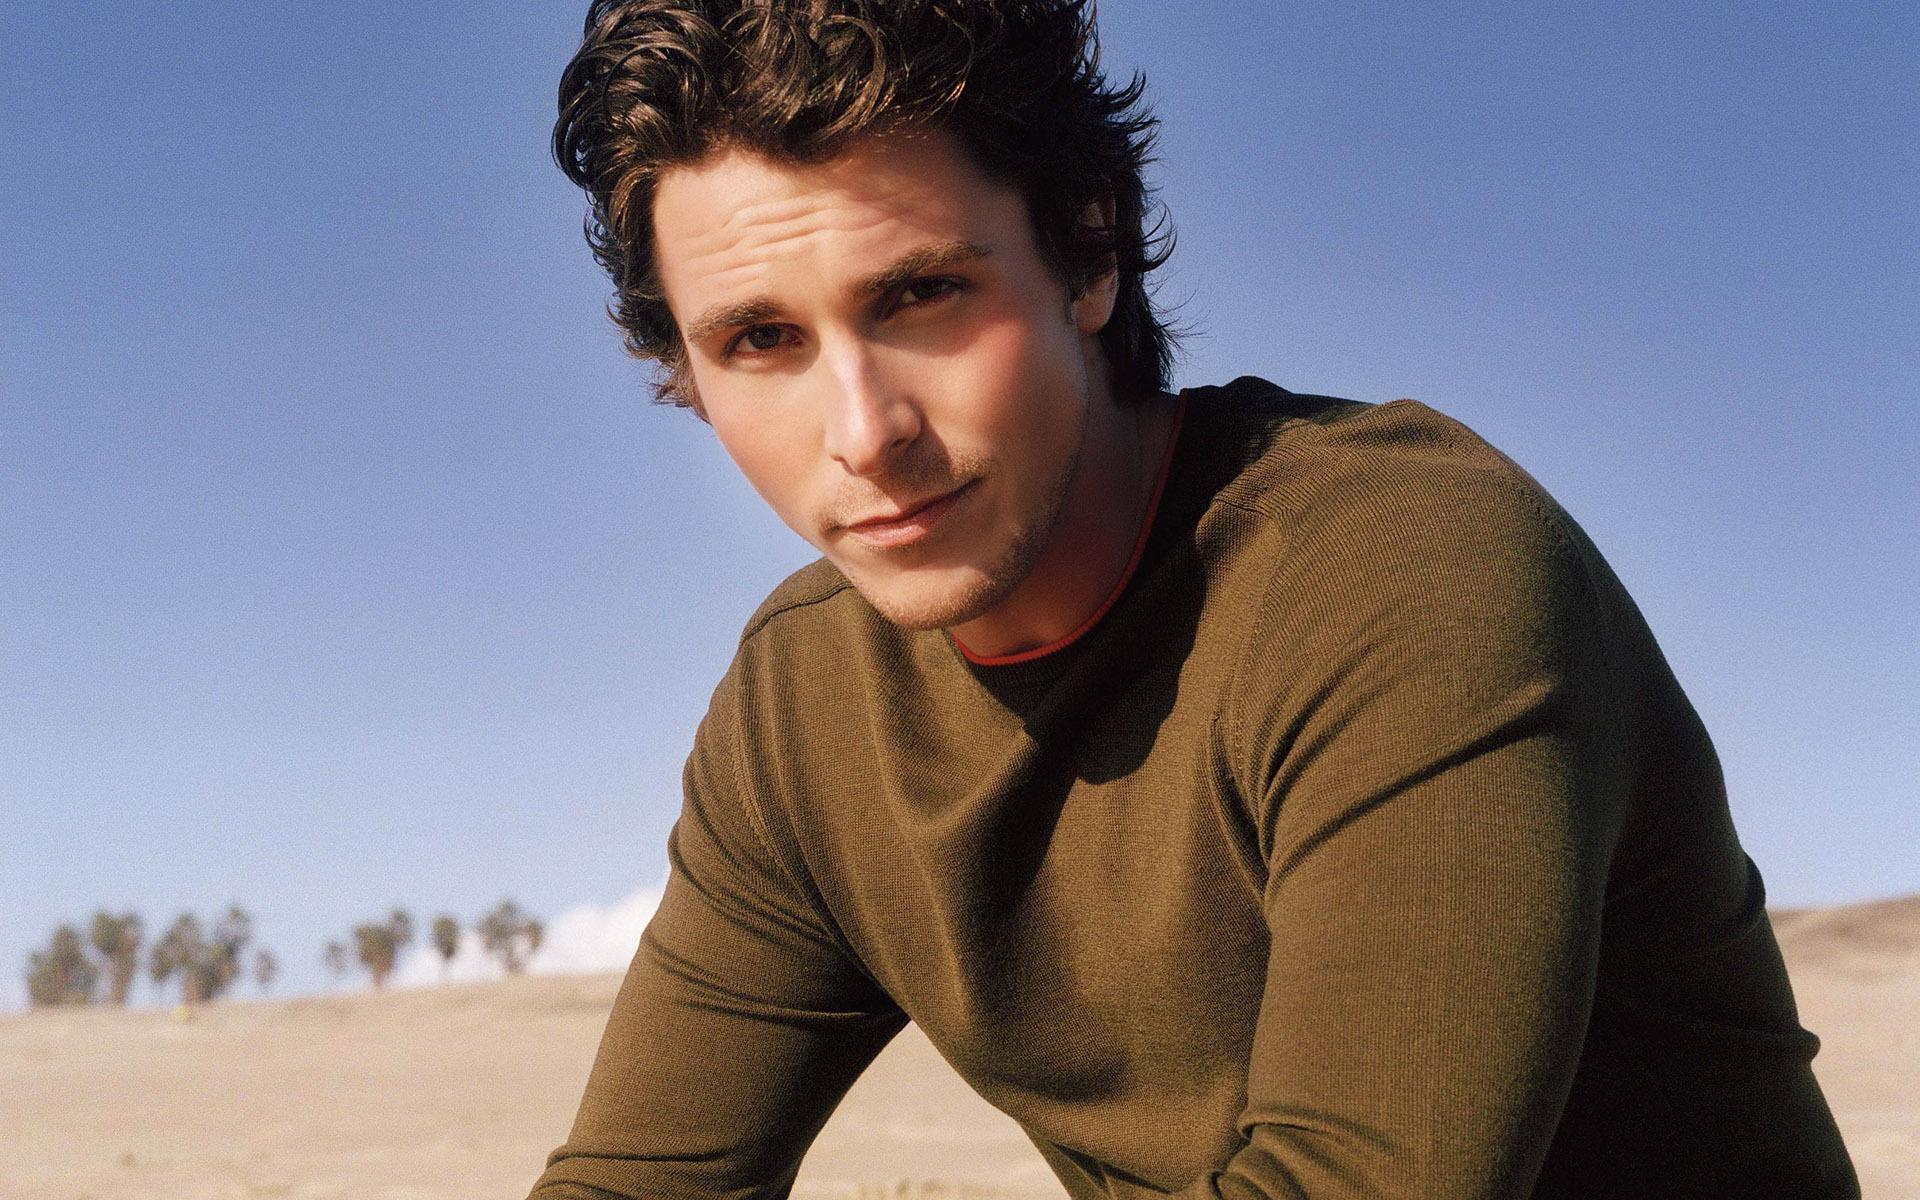 Christian Bale Background